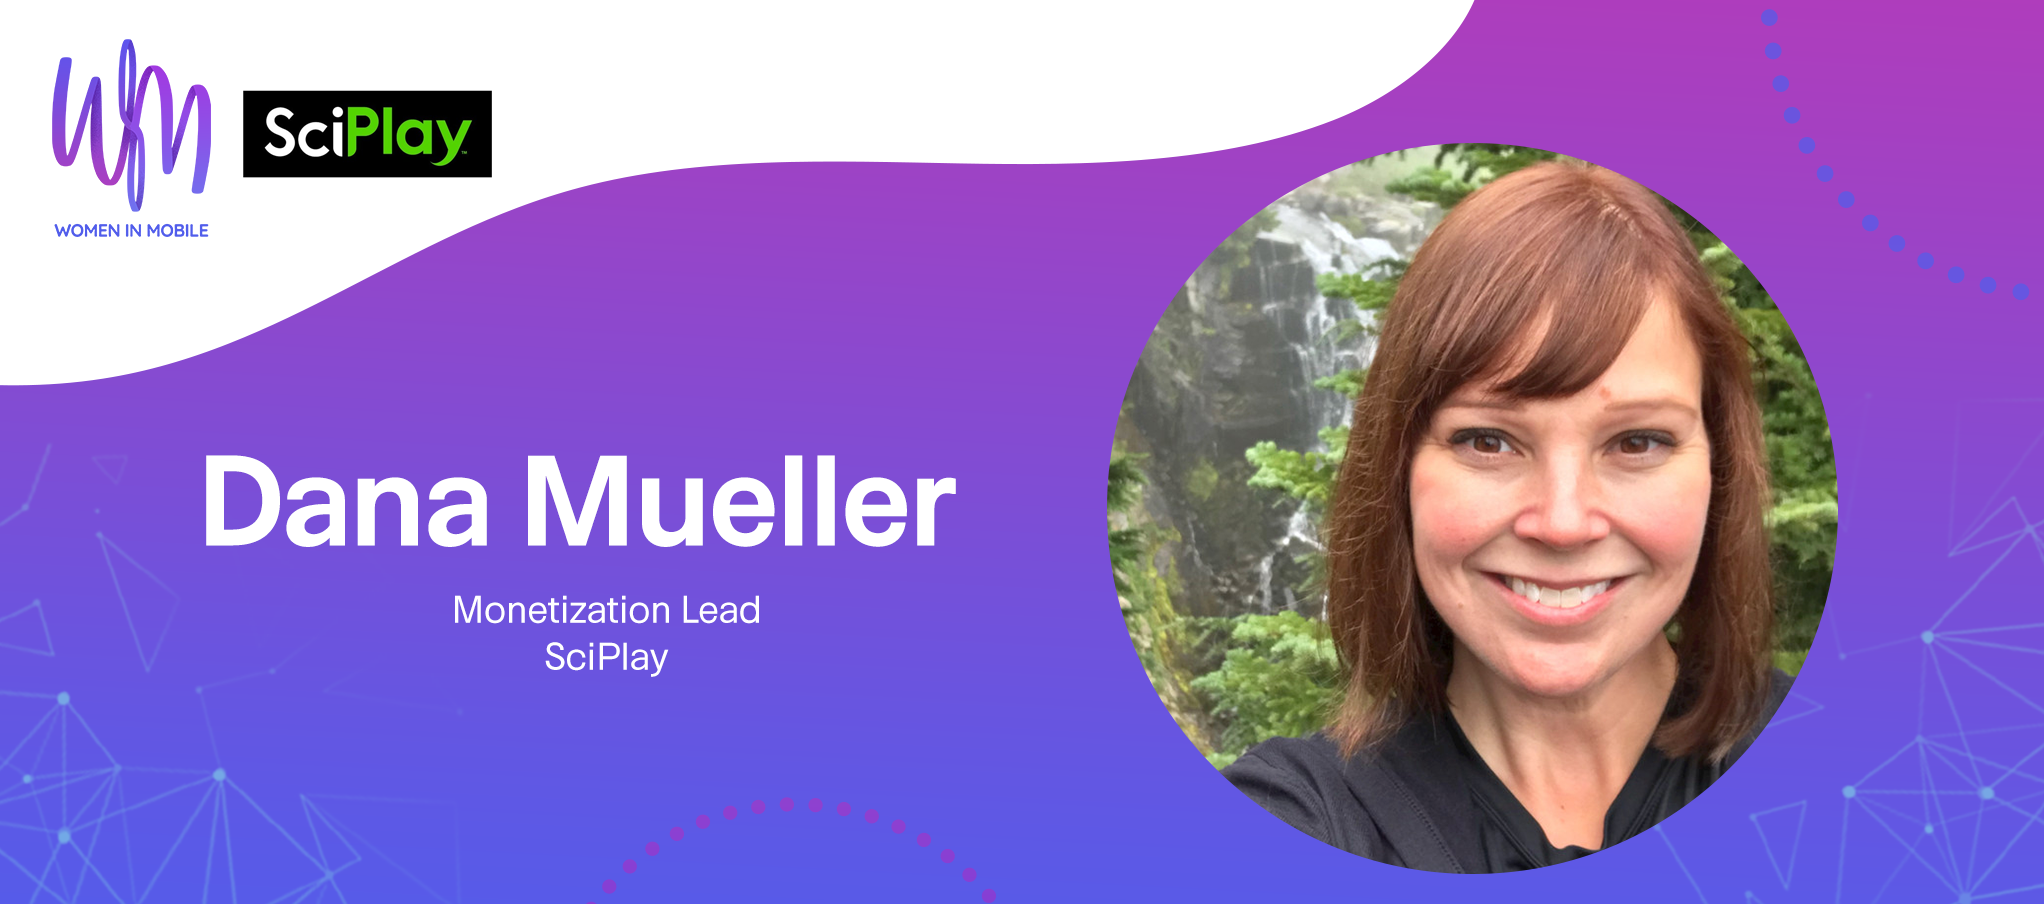 Dana Mueller, Monetization Lead at SciPlay at Aarki's Women in Mobile series